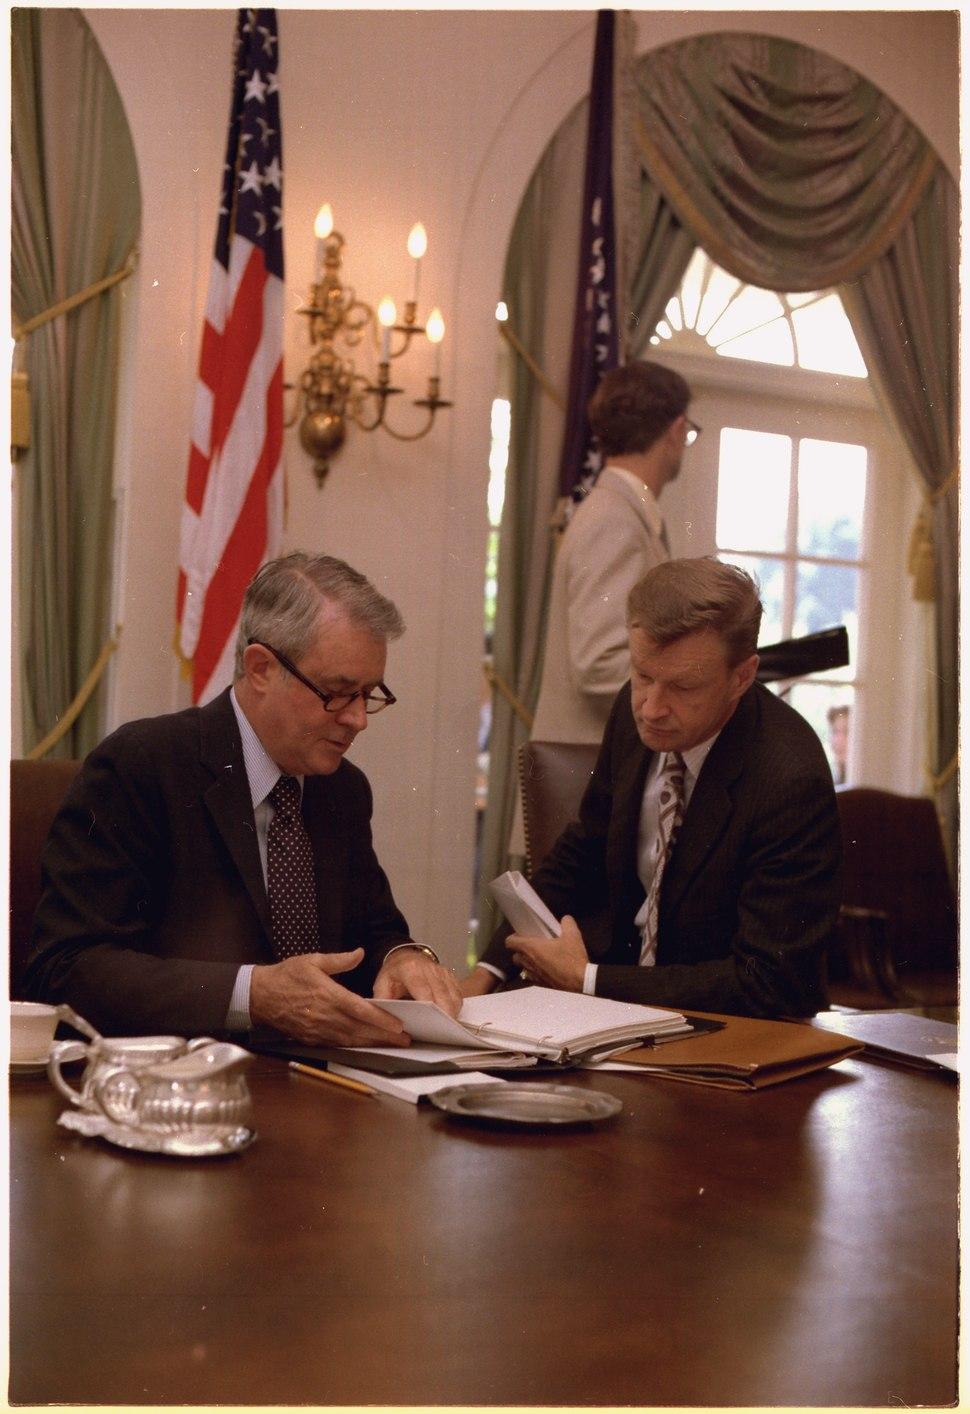 Secretary of State Cyrus Vance and National Security Council Advisor Zbigniew Brzezinski. - NARA - 175514